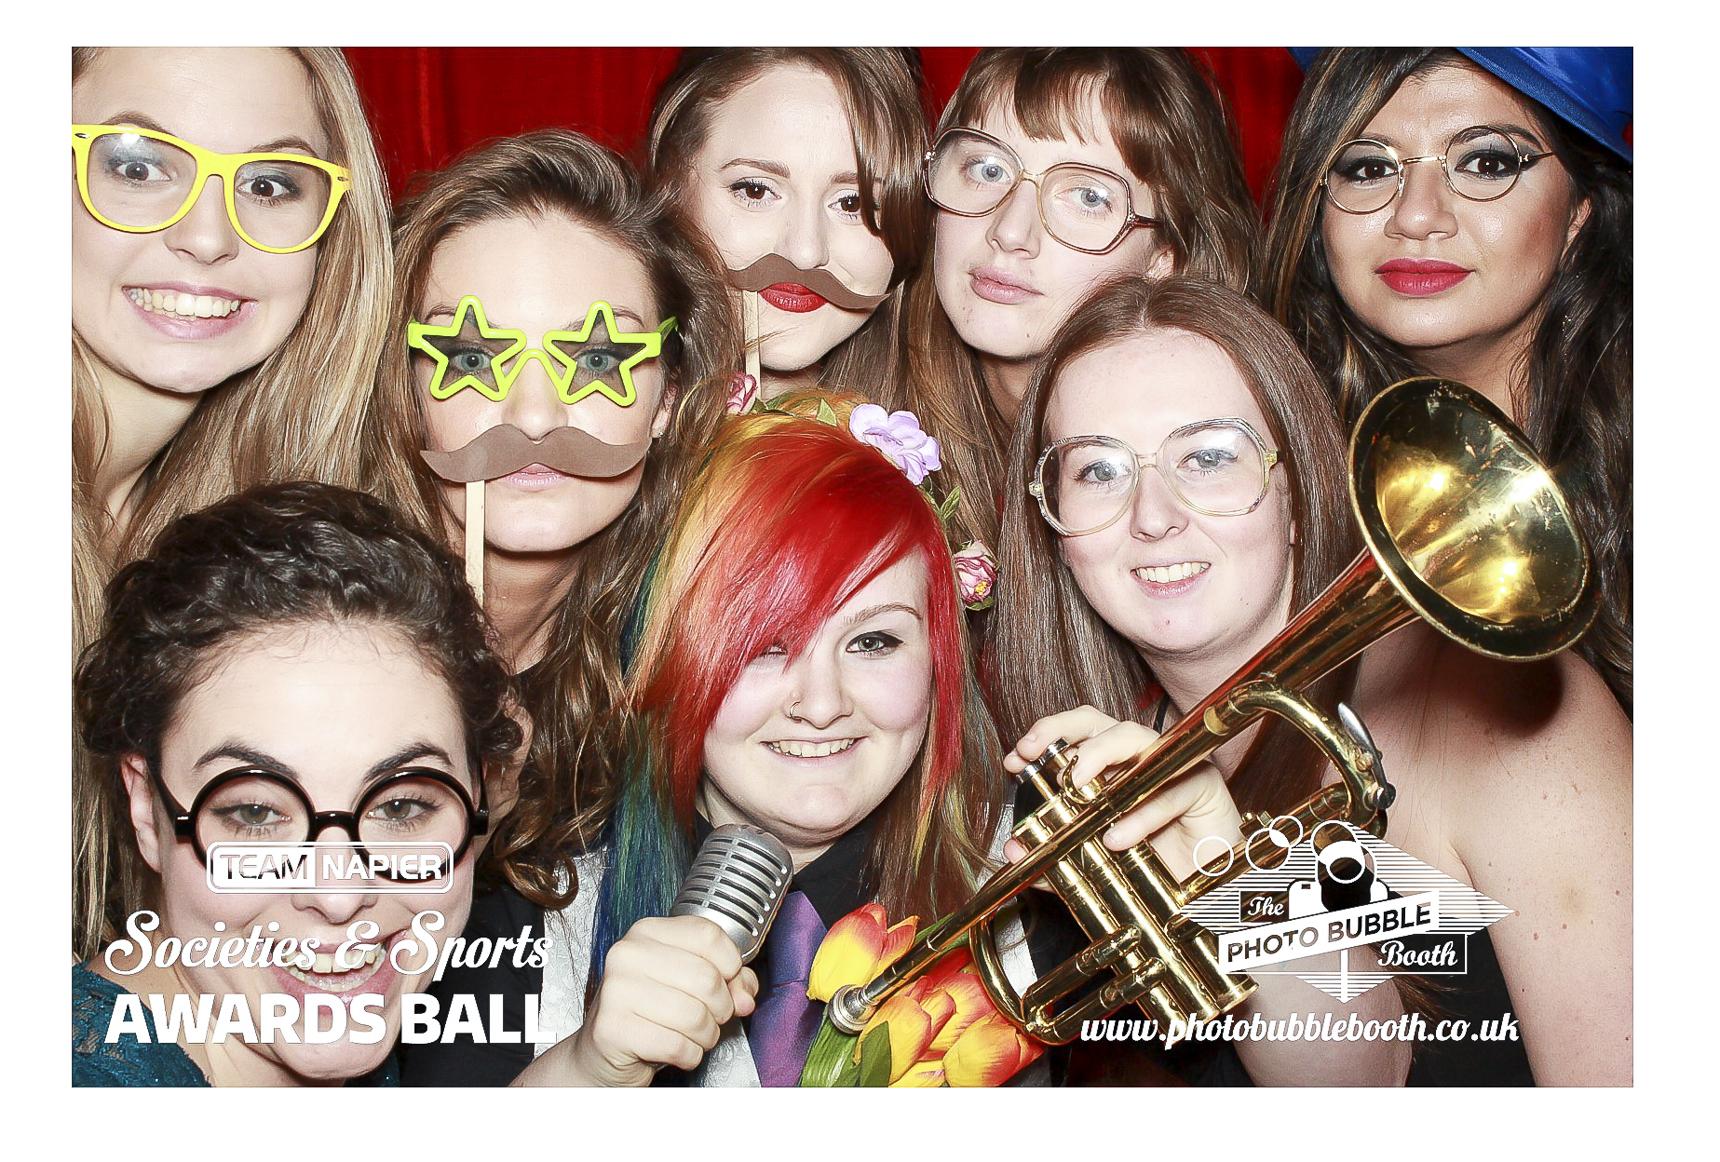 Napier Societies & Sports Awards_43.JPG